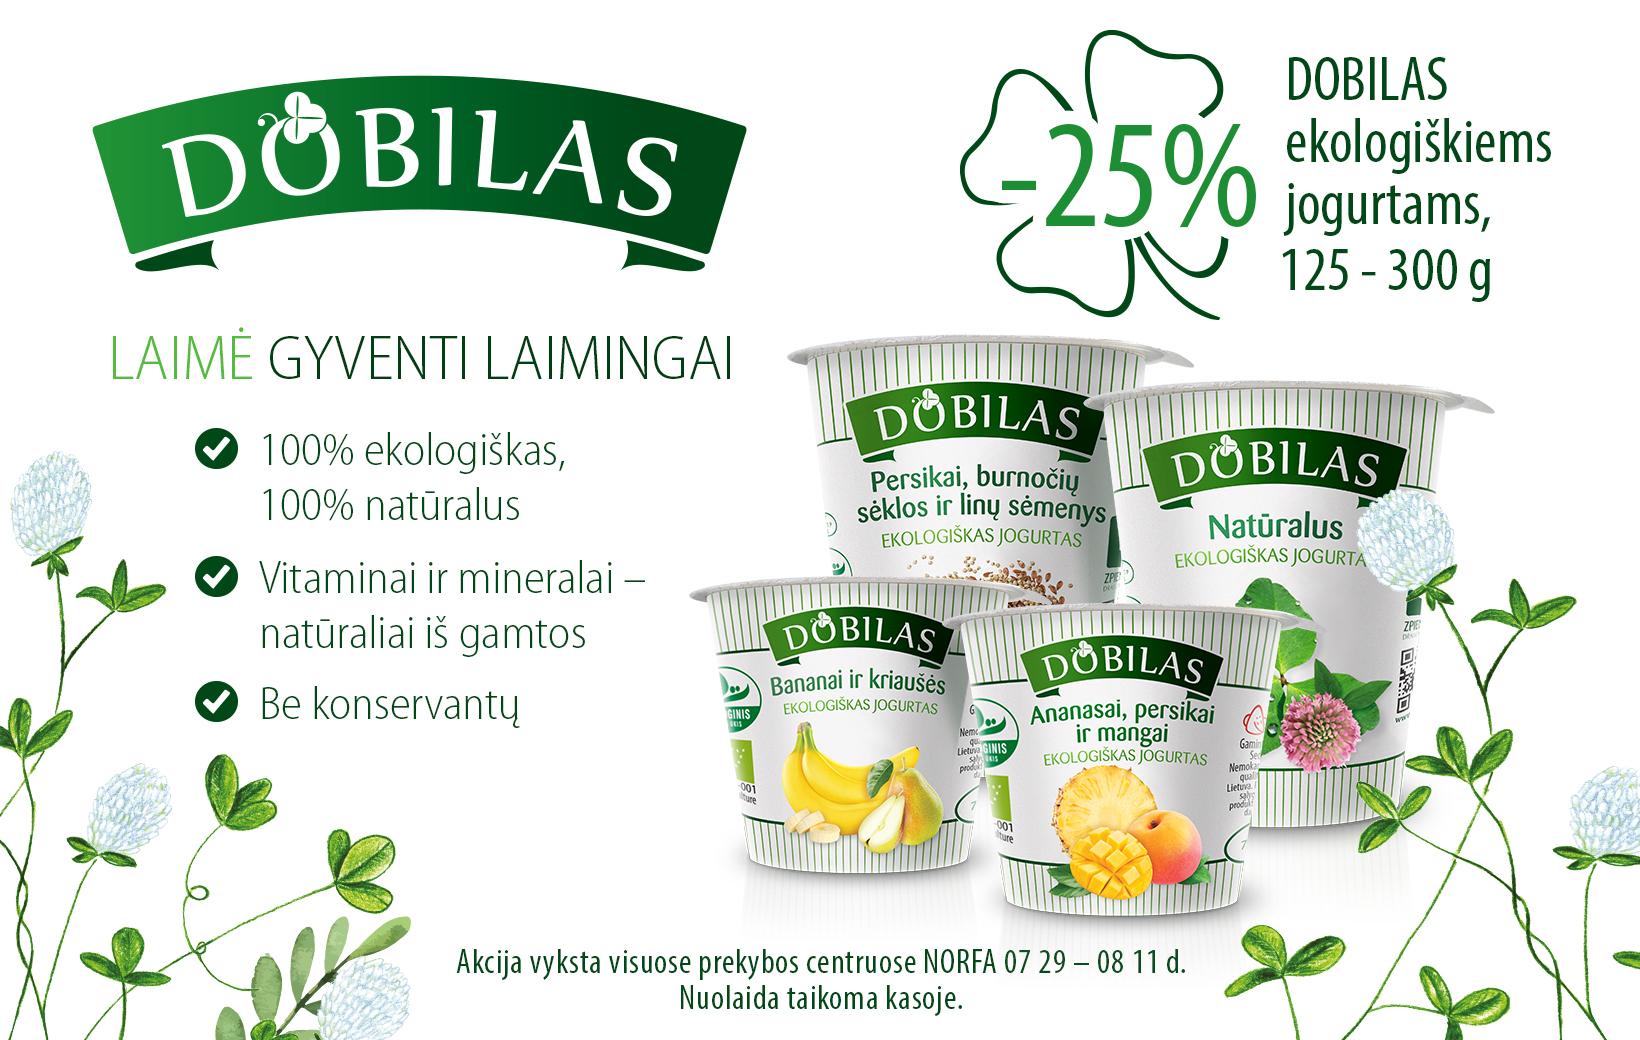 DOBILAS jogurtų akcija